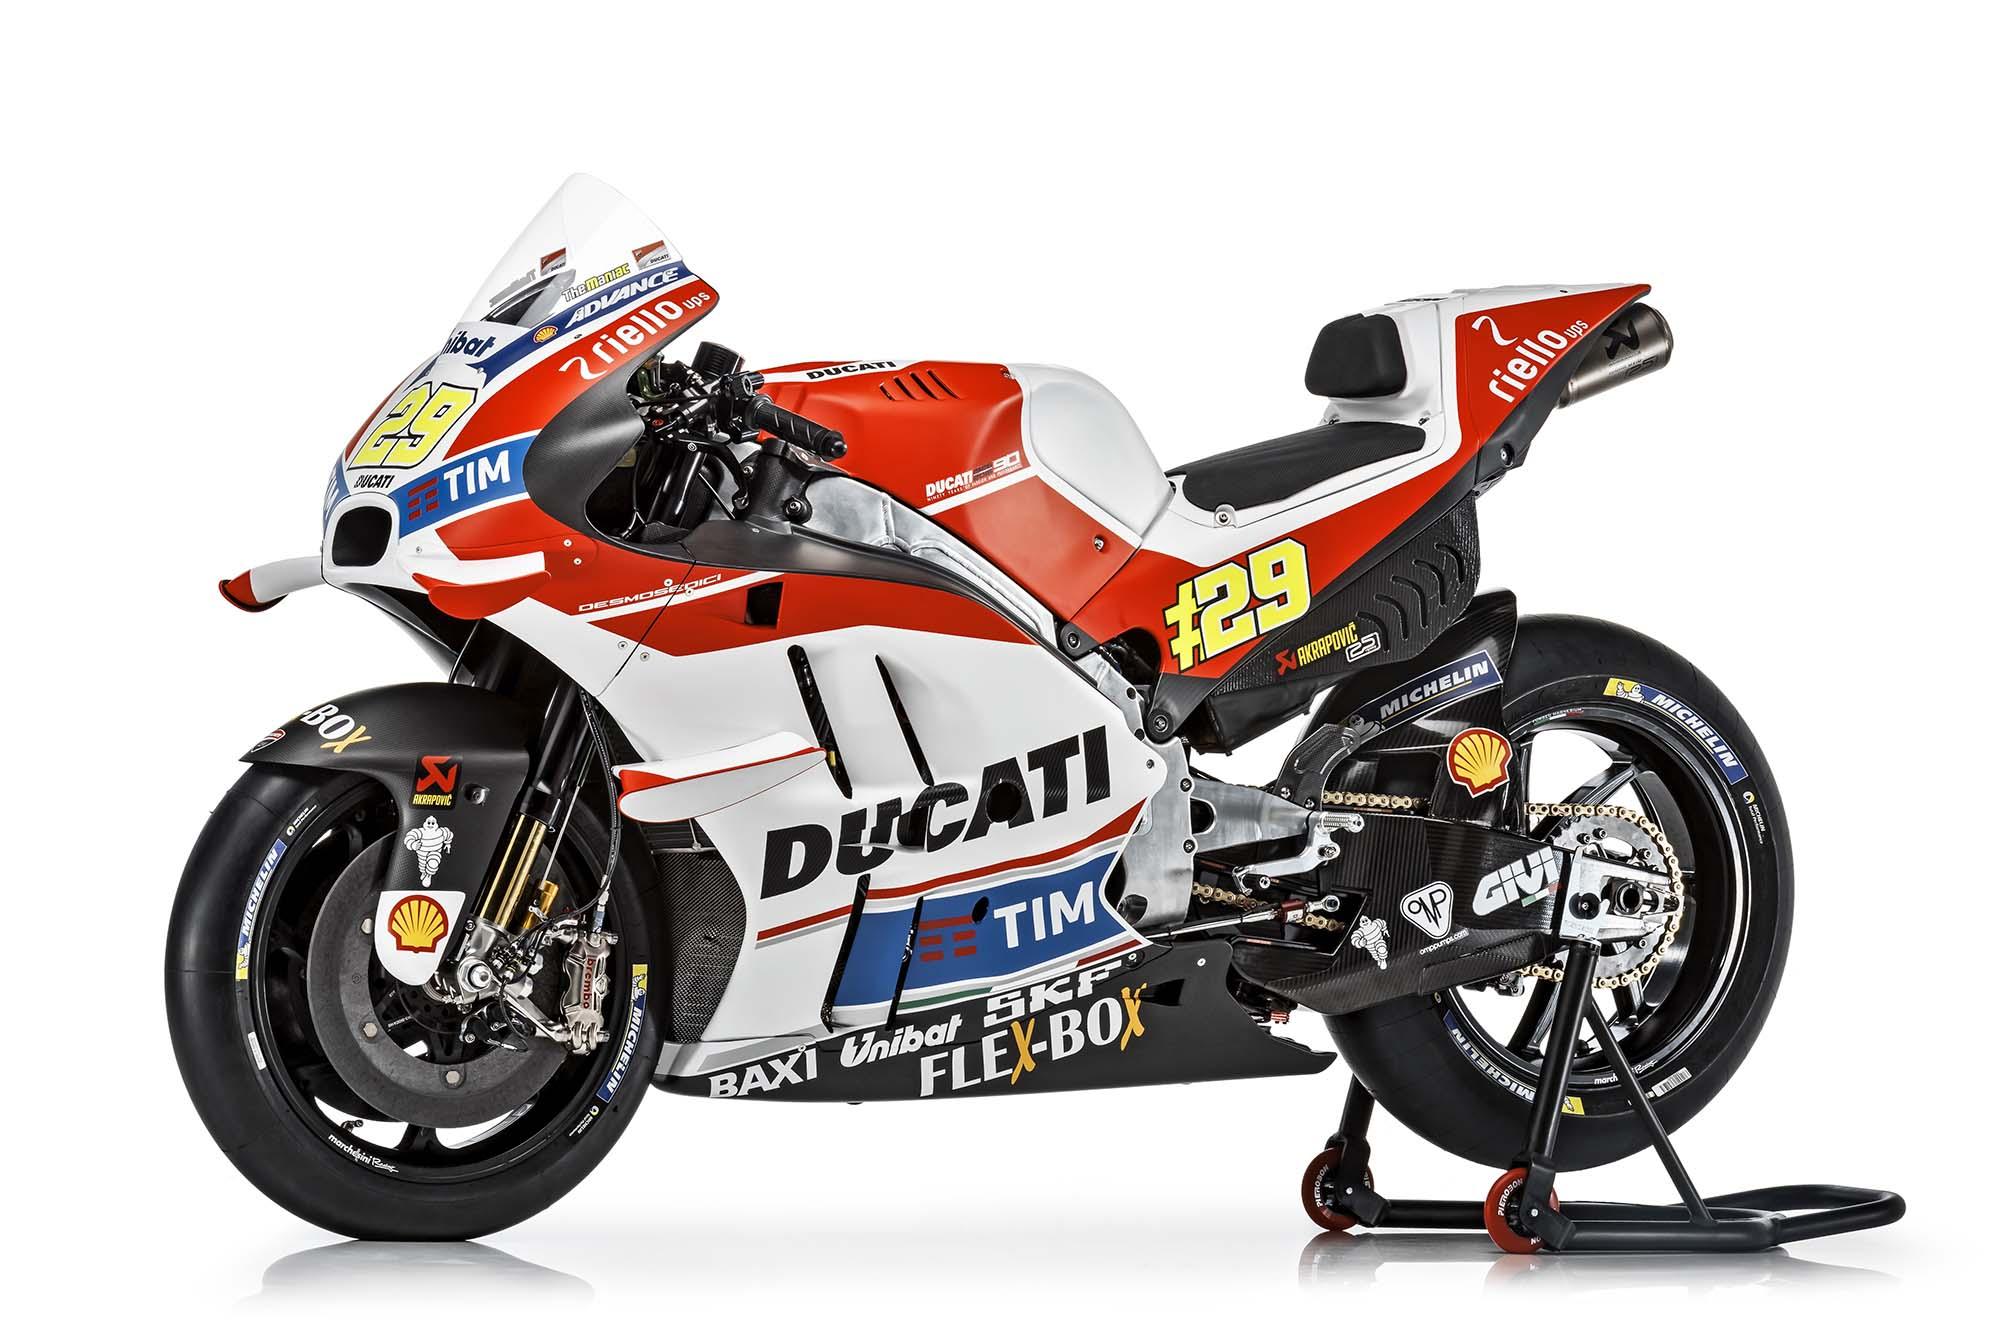 WSBK vs MotoGP: What's the difference? - BikesRepublic